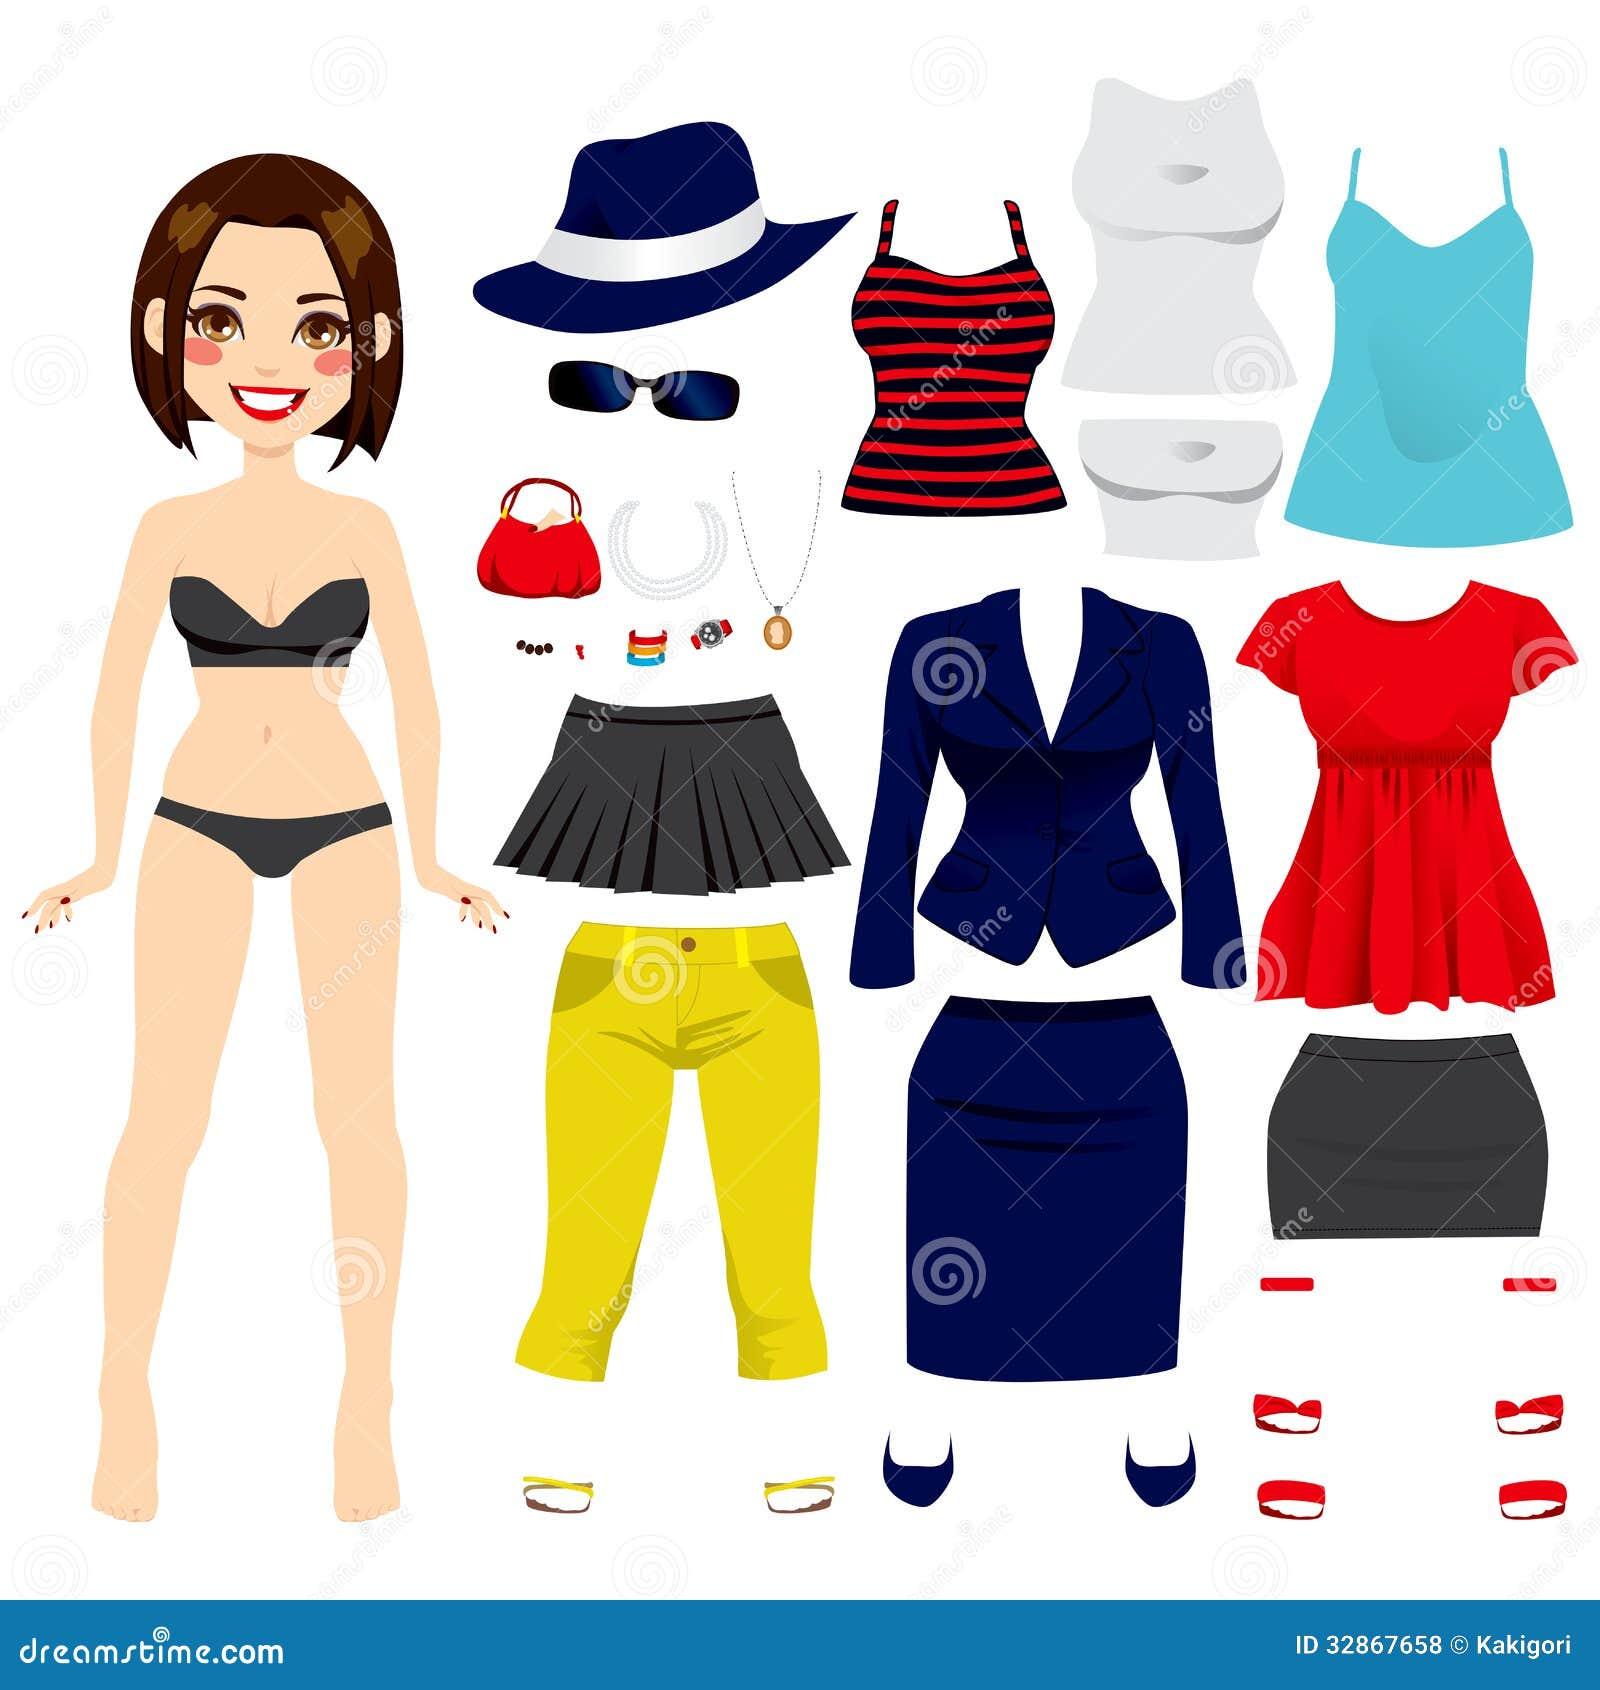 Cute short hair brunette girl paper doll game fashion clothing set